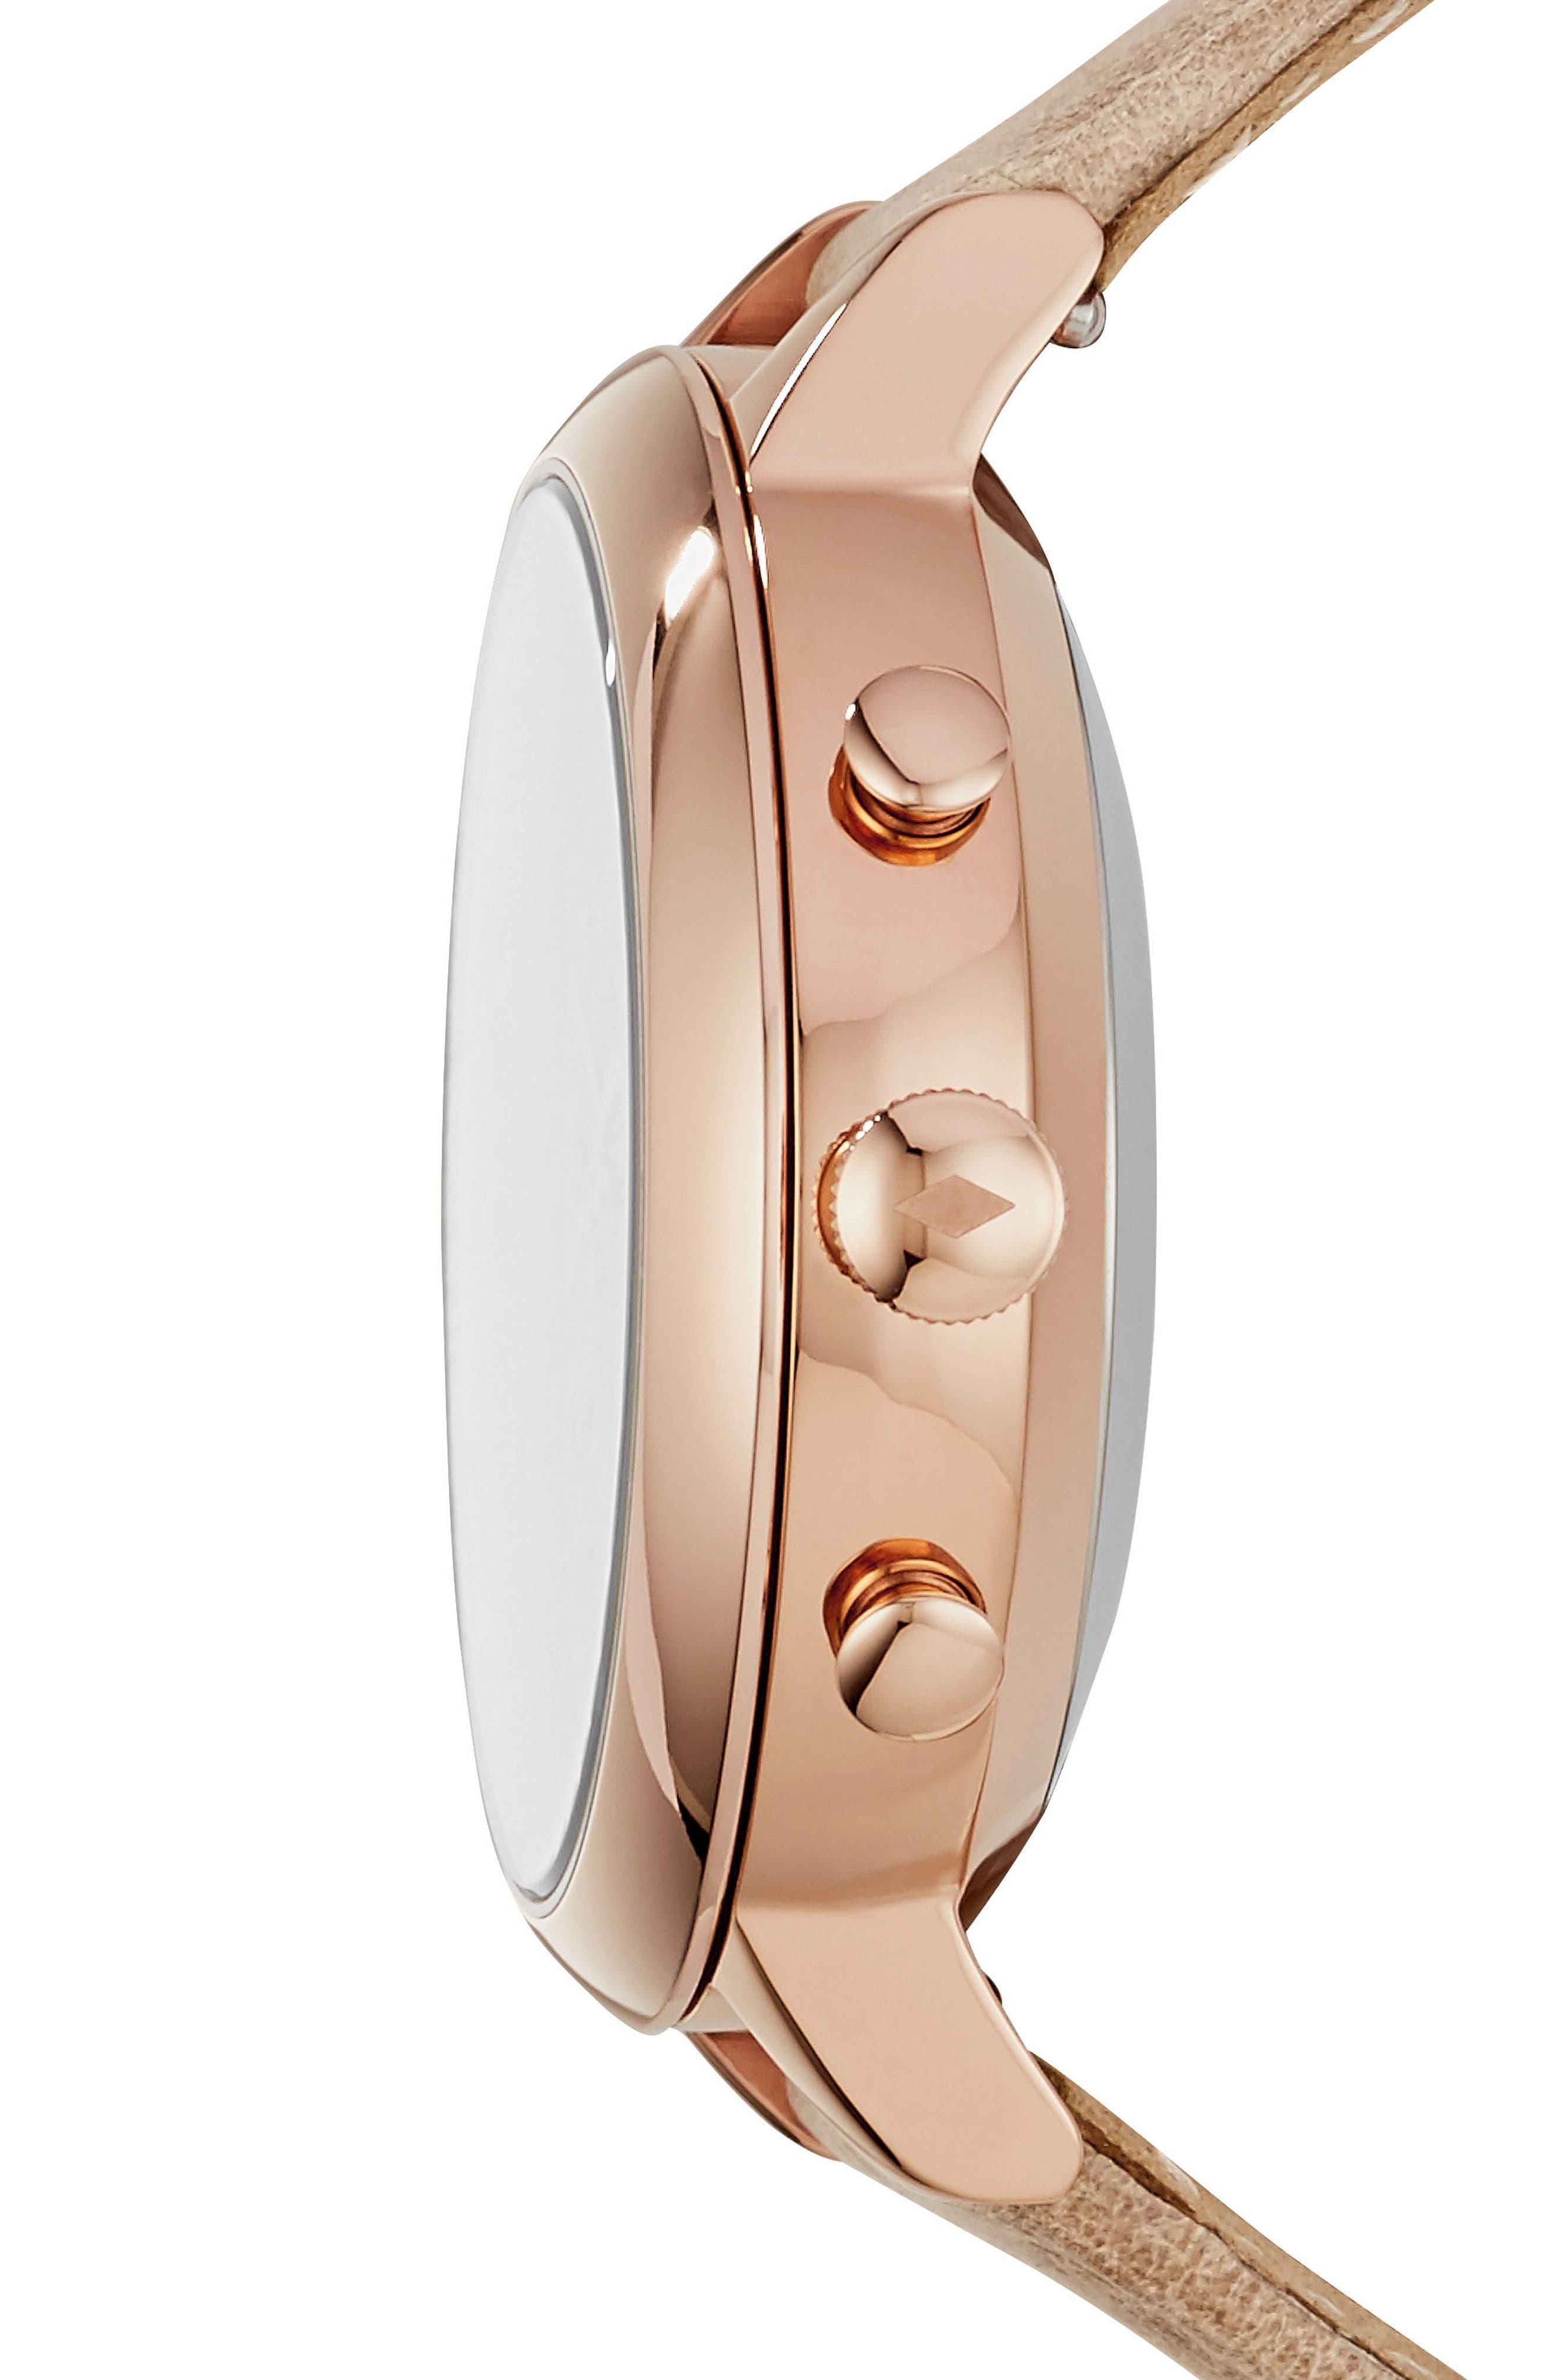 Jacqueline Leather Strap Hybrid Smart Watch, 36mm,                             Alternate thumbnail 3, color,                             Beige/ White/ Rose Gold